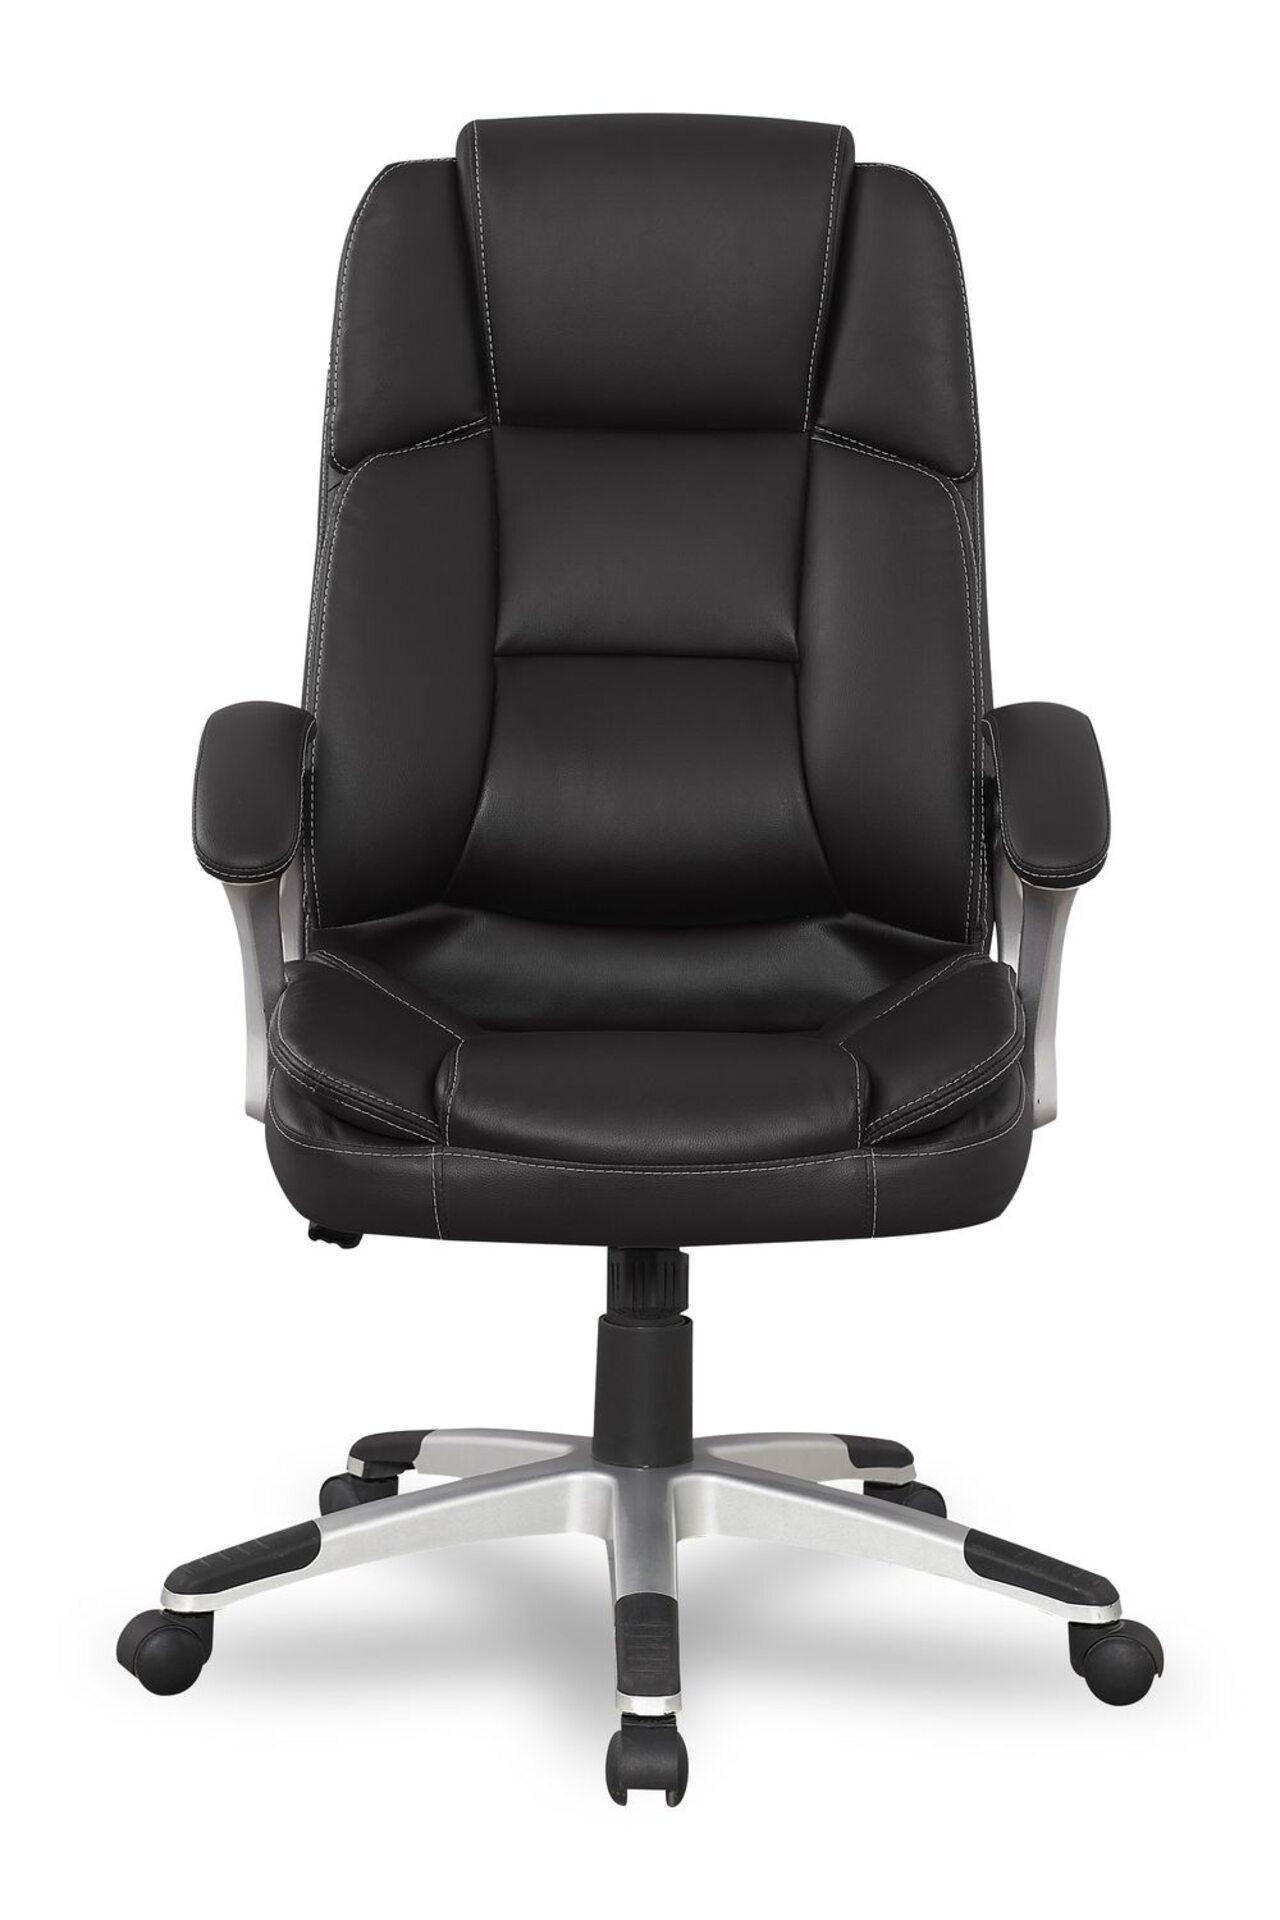 Кресло руководителя College BX-3323 - фото 3